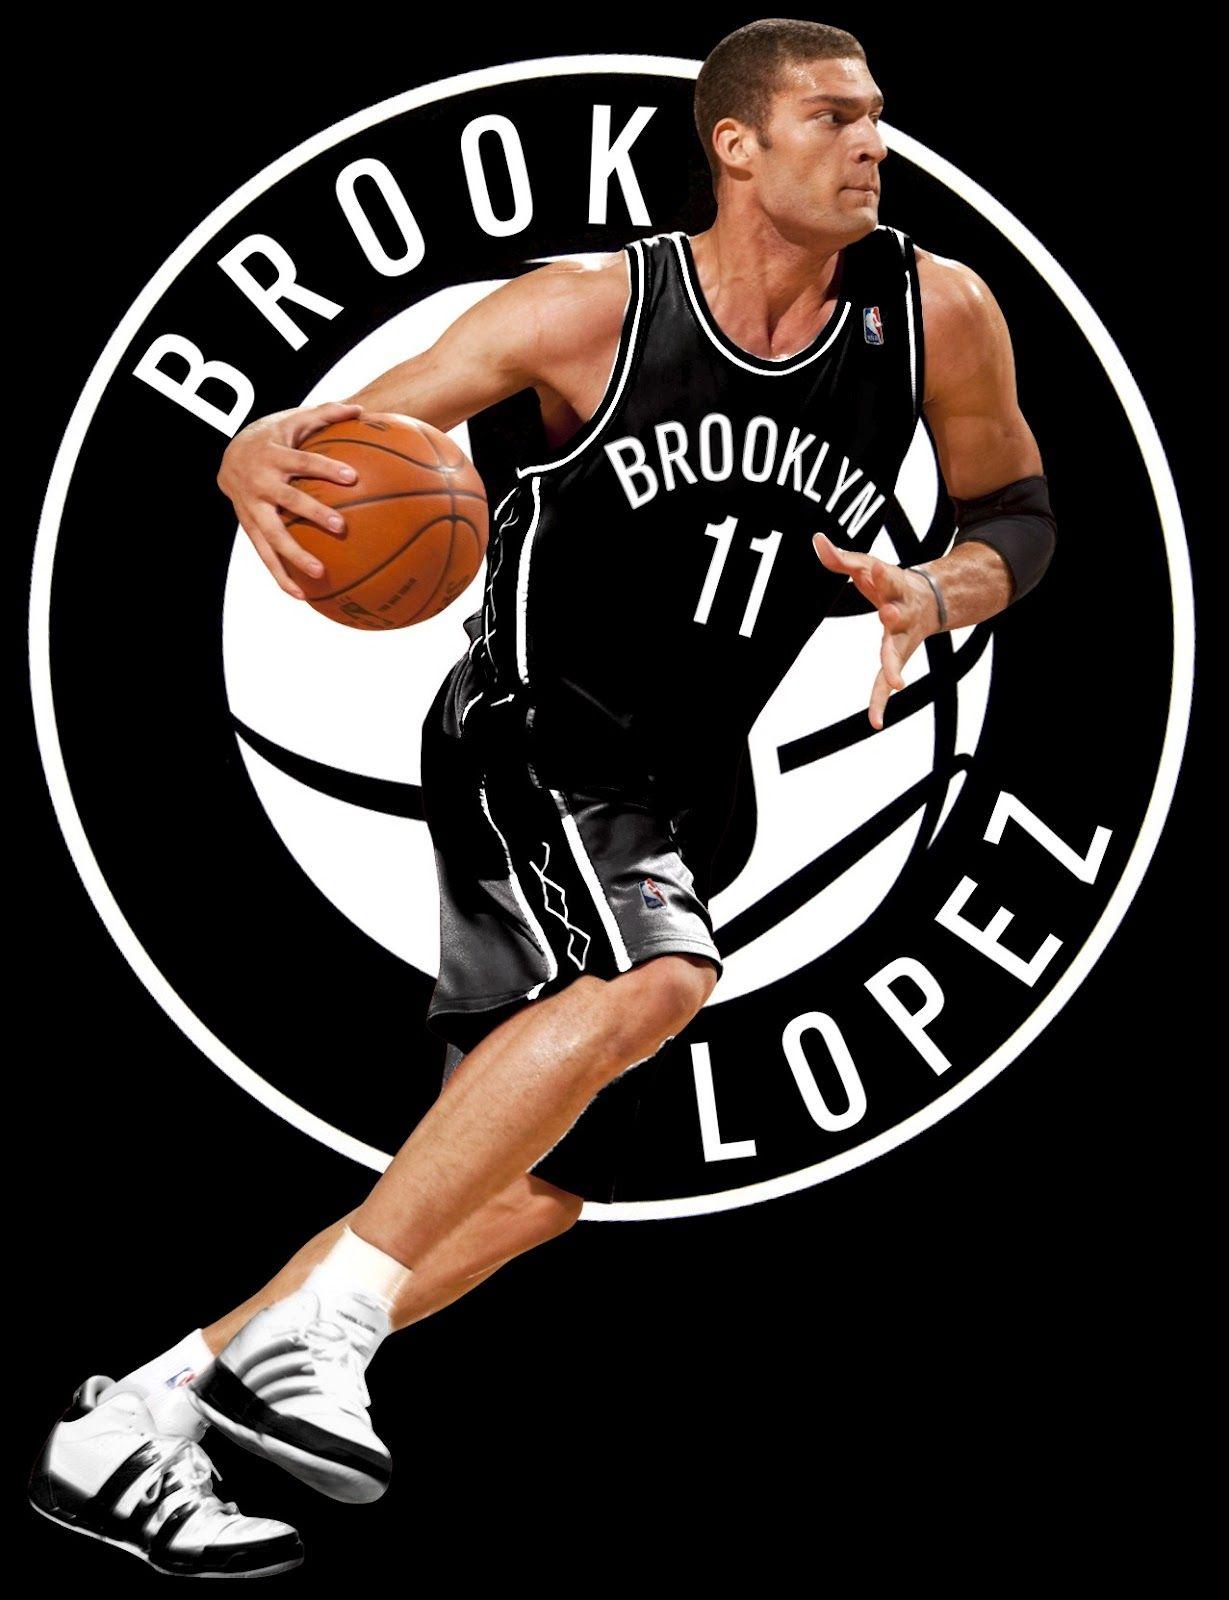 competitive price 4486c 7ead0 Brook Lopez - Brooklyn Nets | Brooklyn Nets | Nets jersey ...